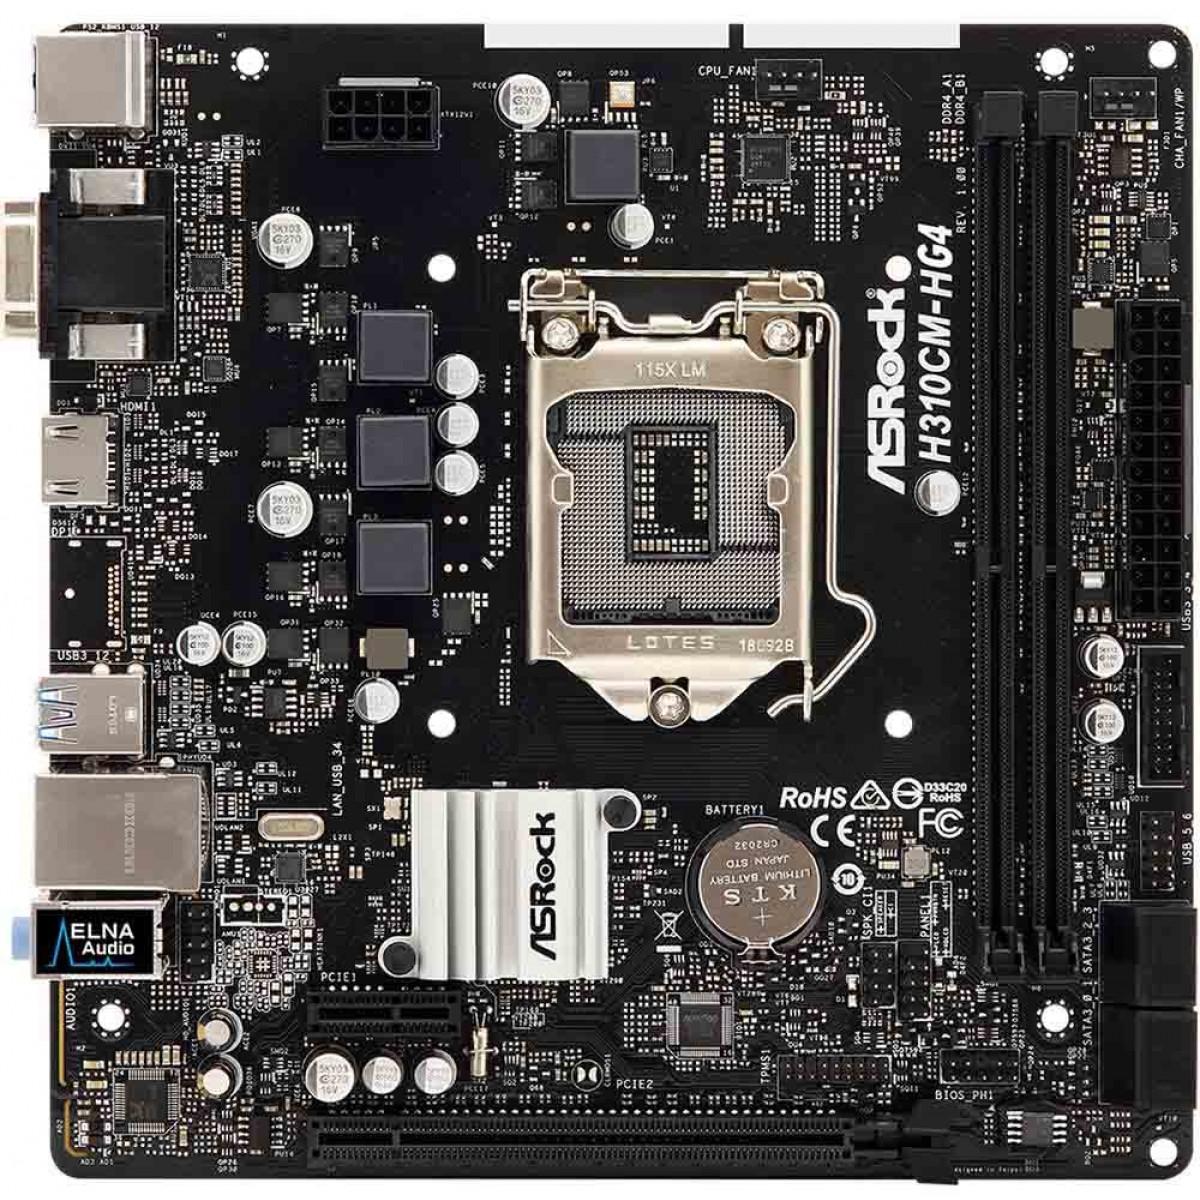 Placa Mãe ASRock H310CM-HG4, Chipset H310, Intel LGA 1151, mATX, DDR4